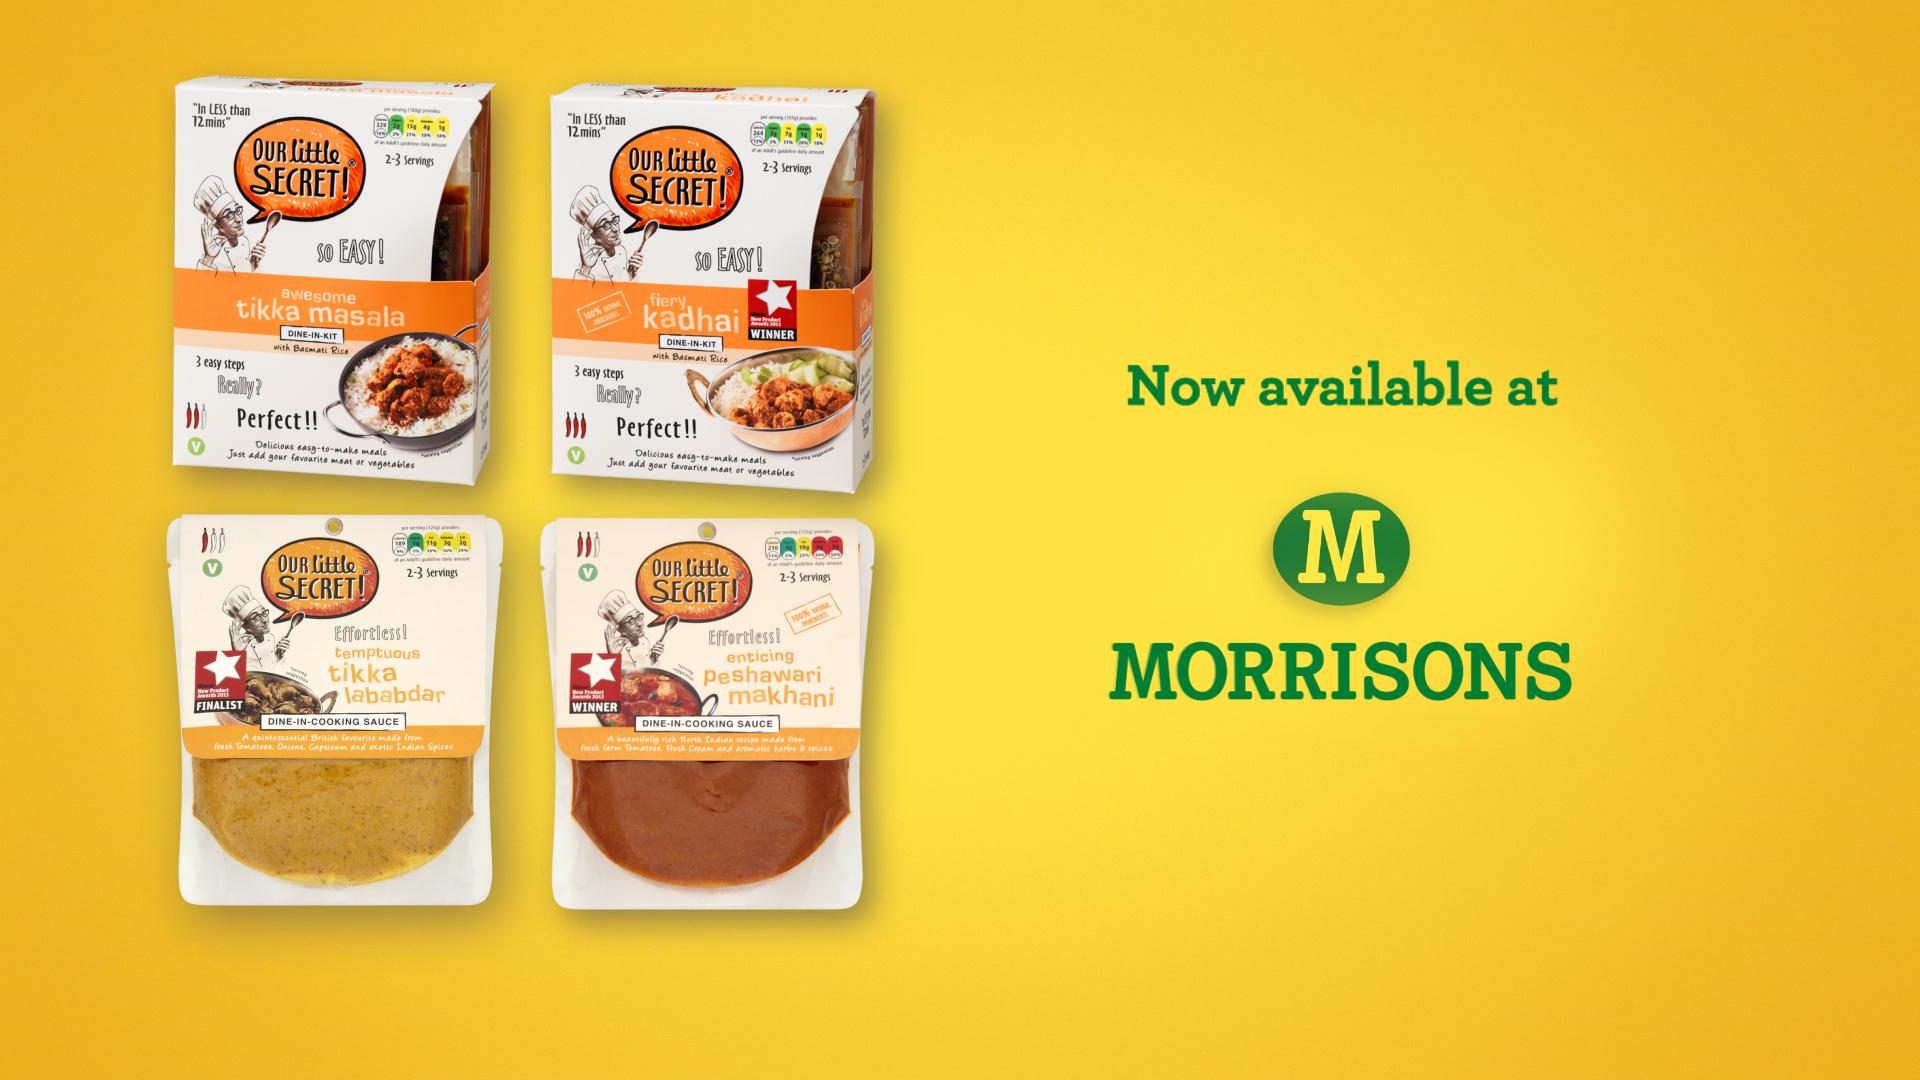 Our Little Secret : Available At Morrisons TVC